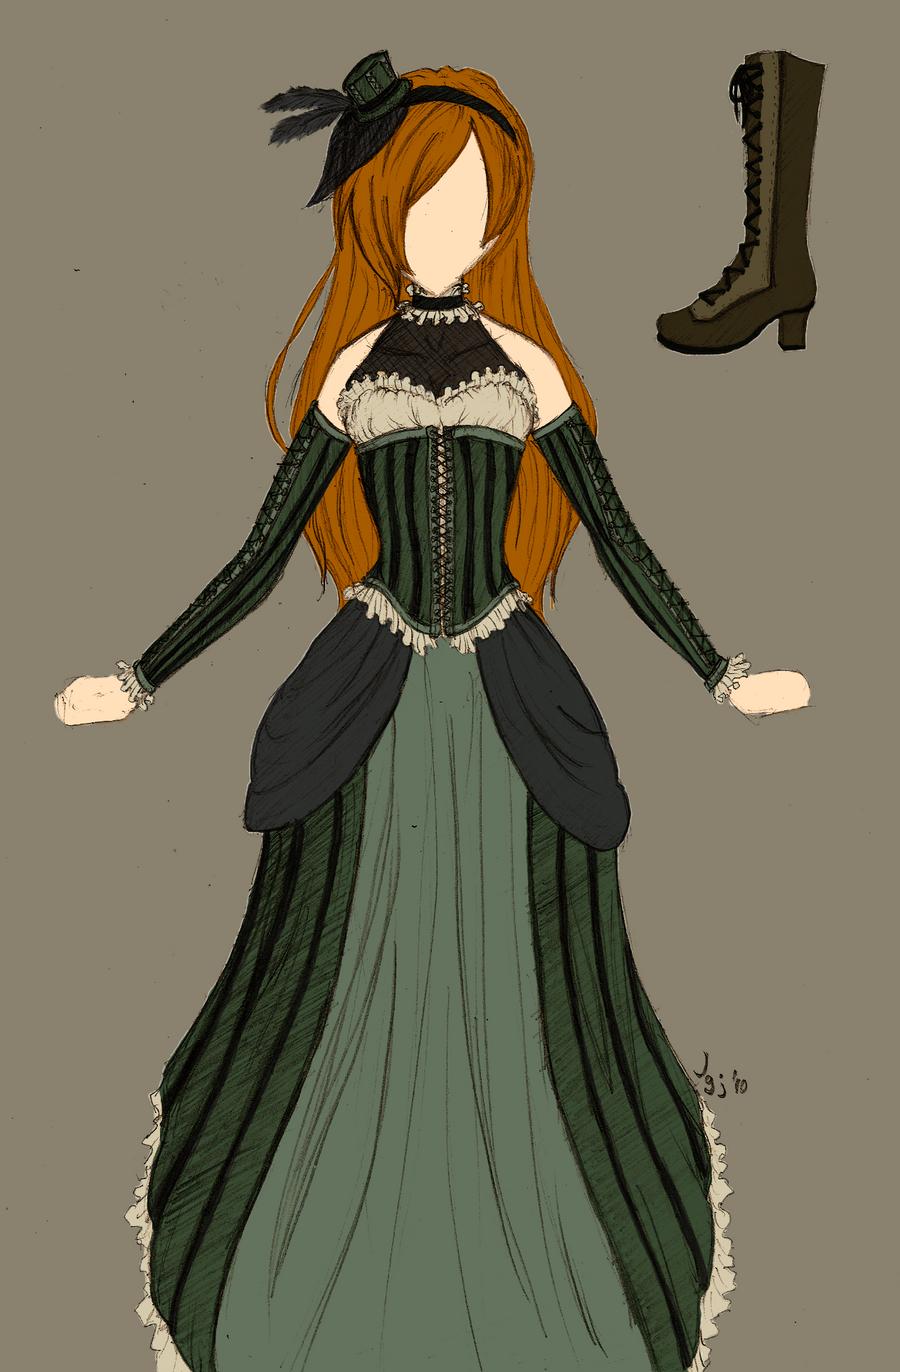 Steampunk Dress Designs | www.imgkid.com - The Image Kid ...